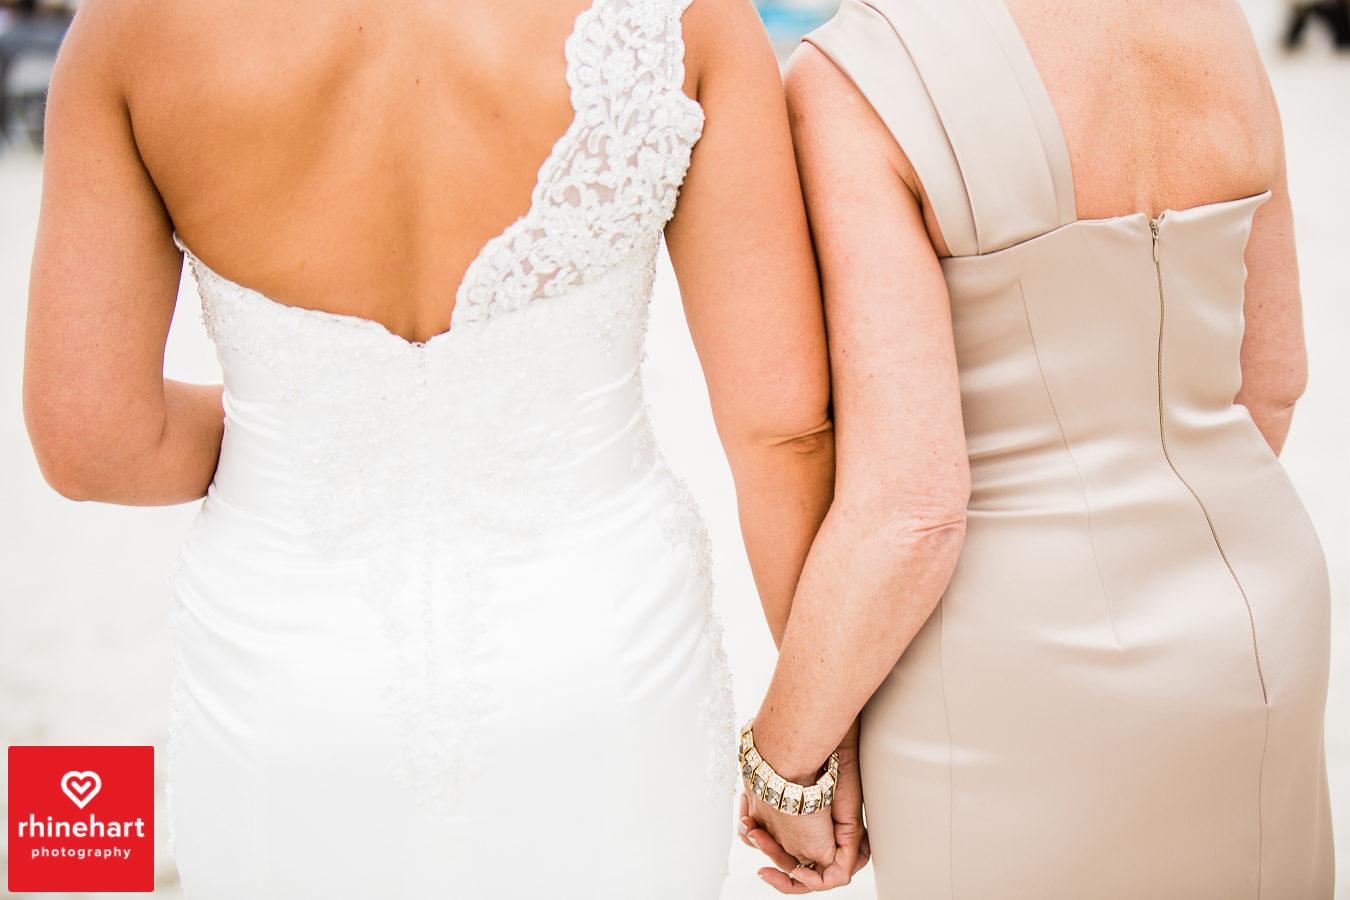 reeds-stone-harbor-wedding-photographer-118